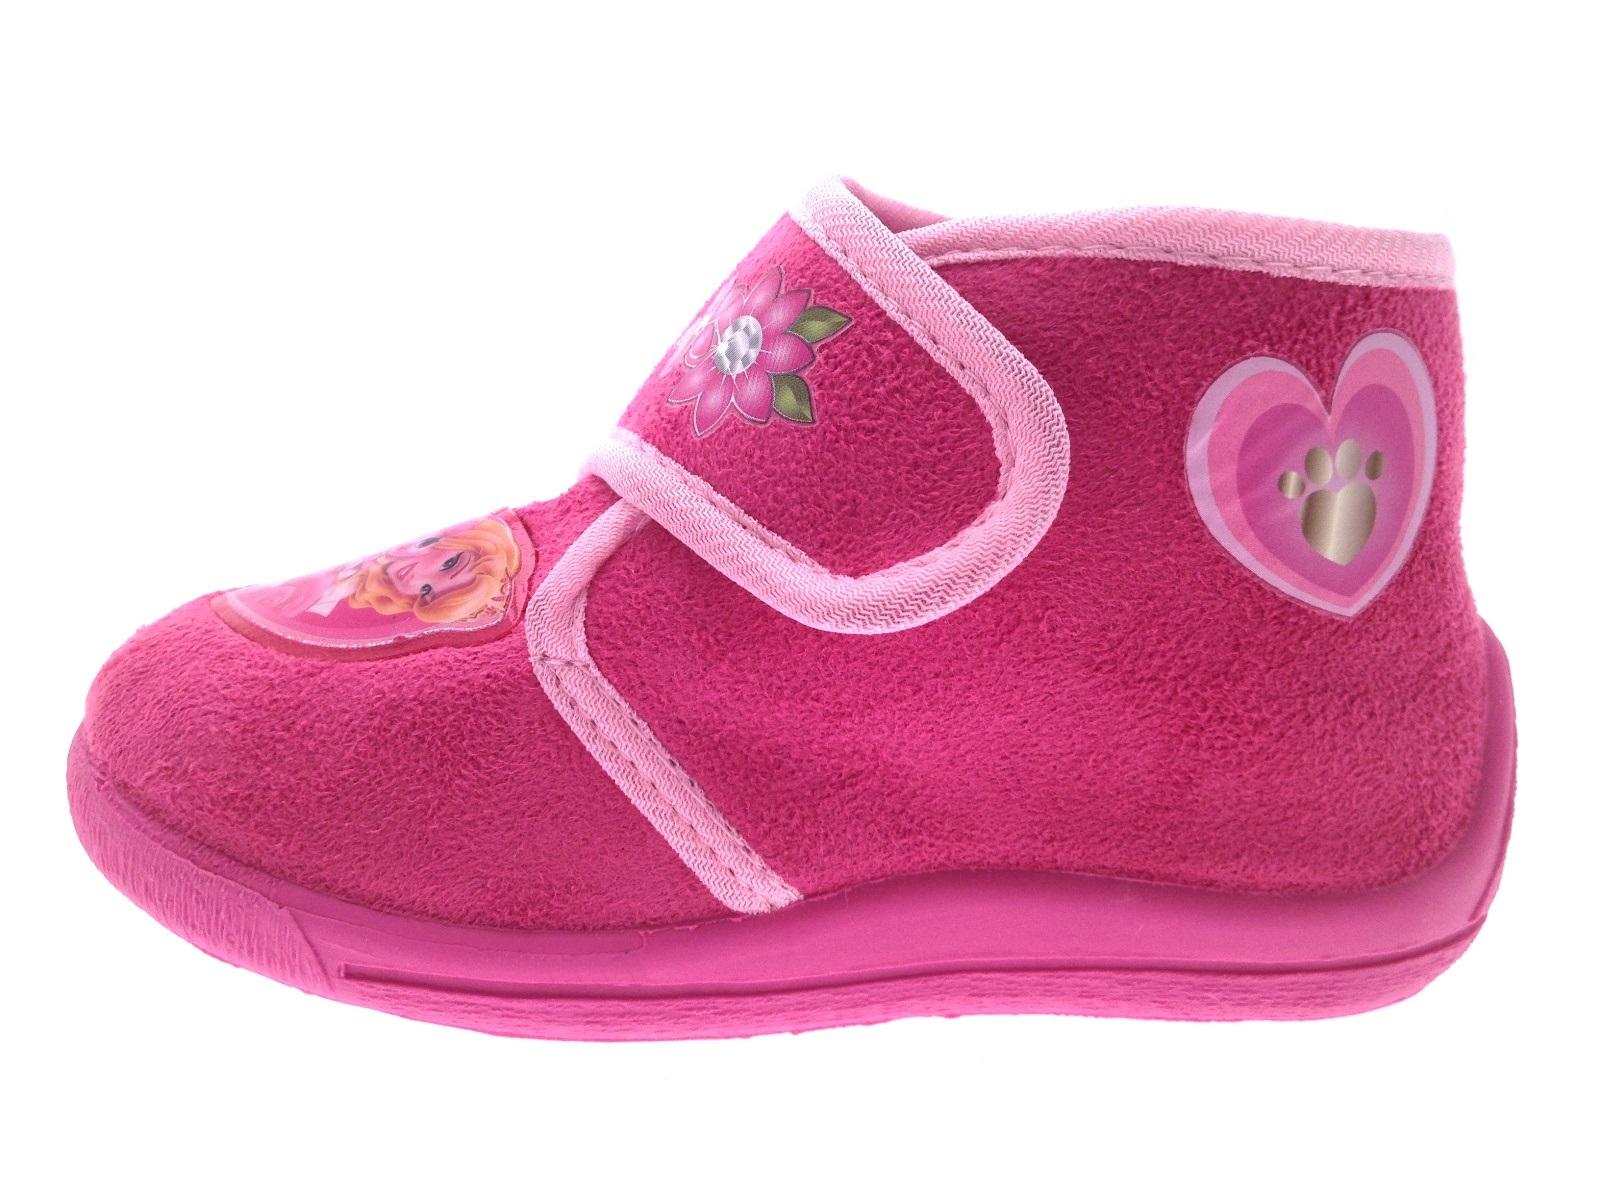 Kids Girls Disney Princess Palace Pets Pink Slippers Booties Shoes Size UK 4 - 9